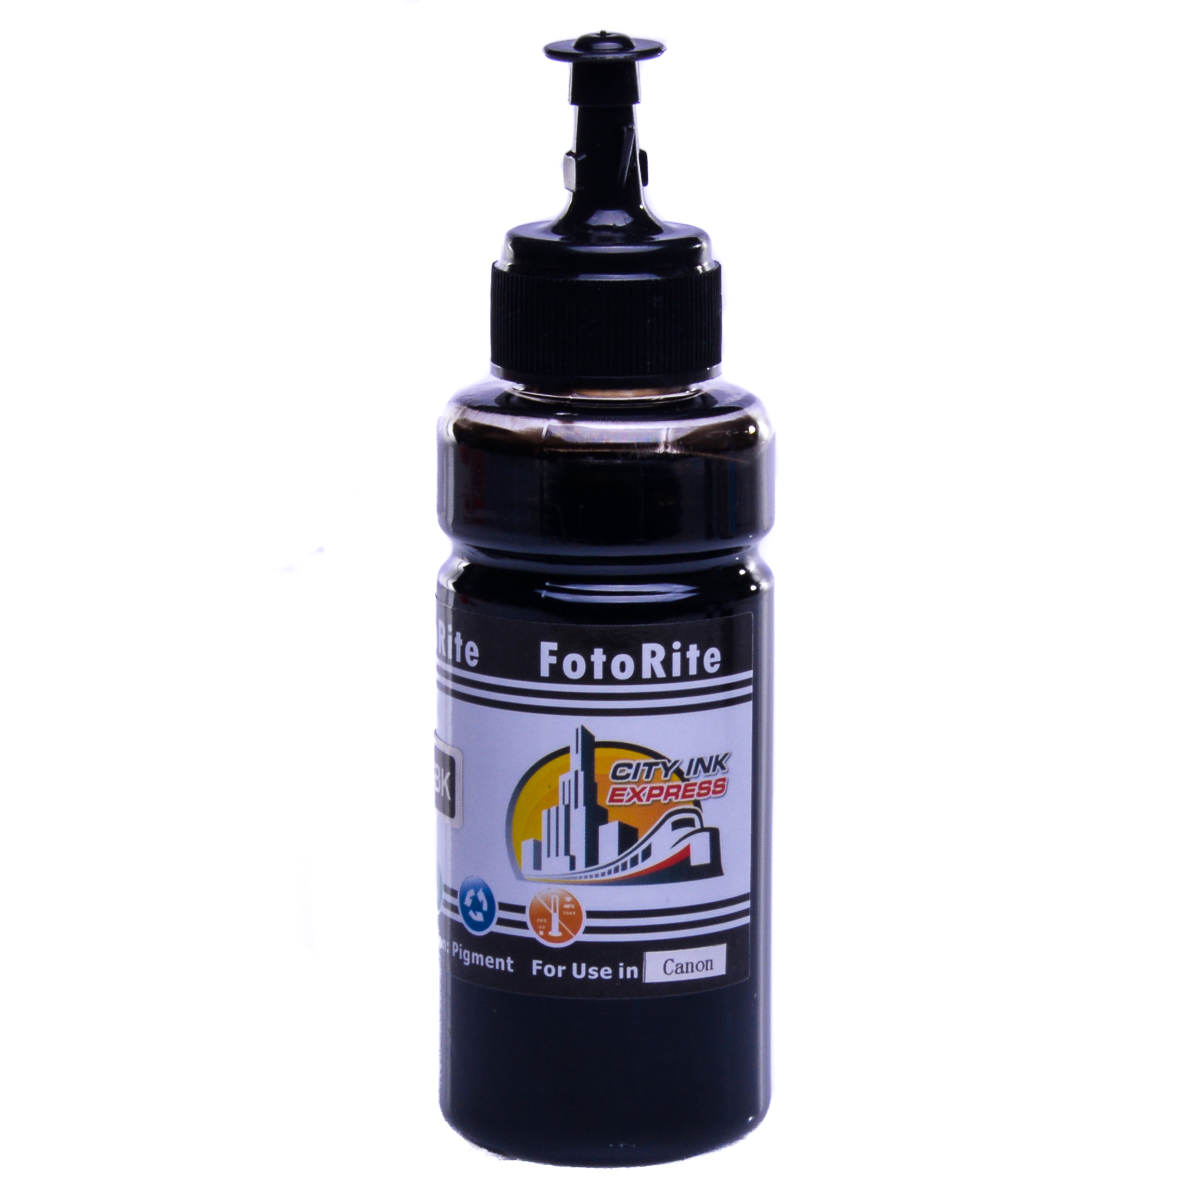 Cheap Pigment Black pigment ink replaces Canon Pixma MG5752 - PGI-570PGBK